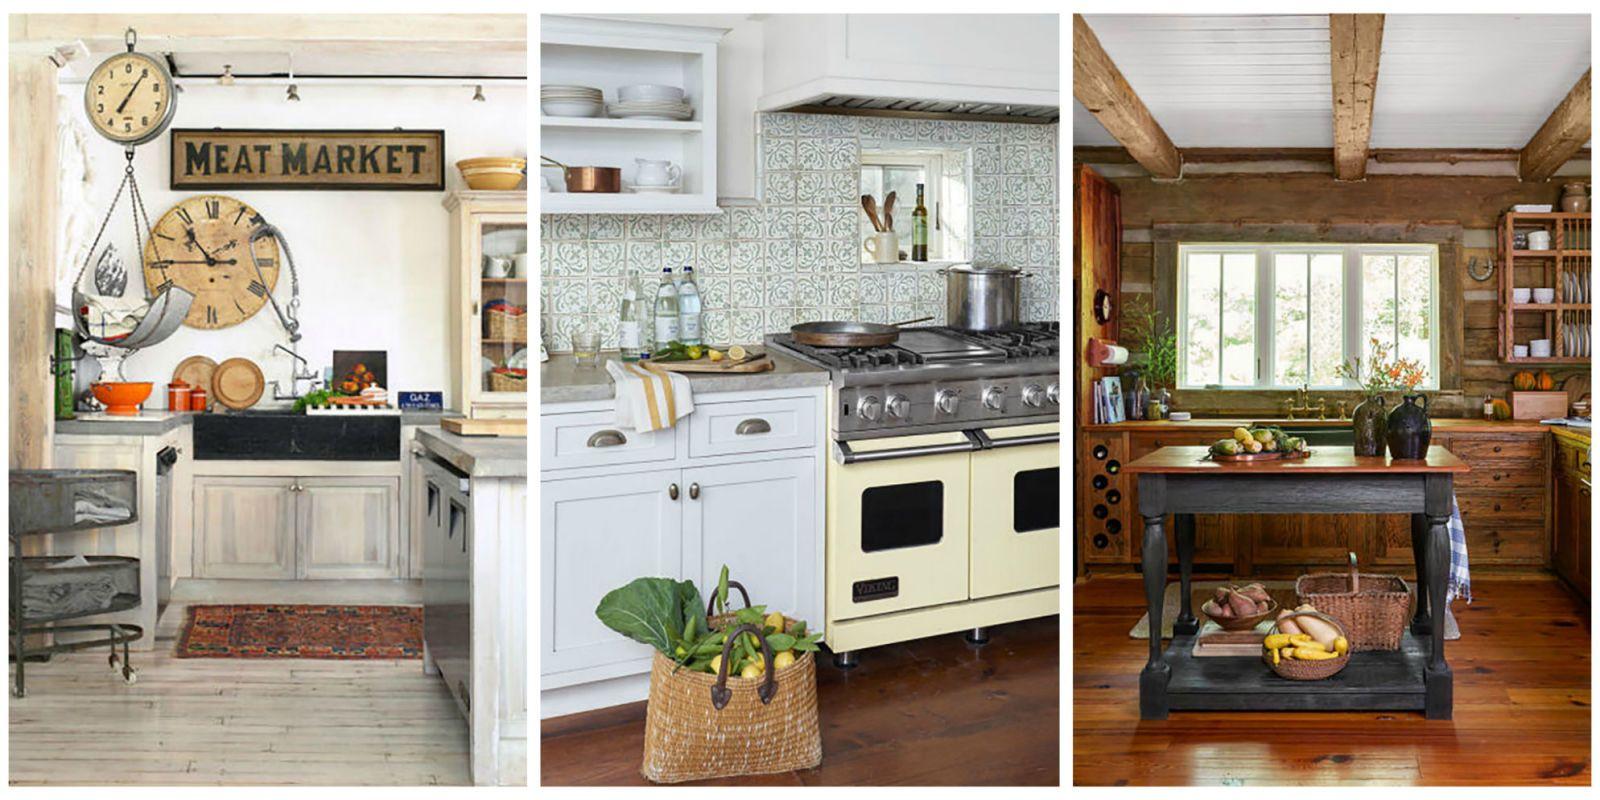 & 18 Farmhouse Style Kitchens - Rustic Decor Ideas for Kitchens kurilladesign.com